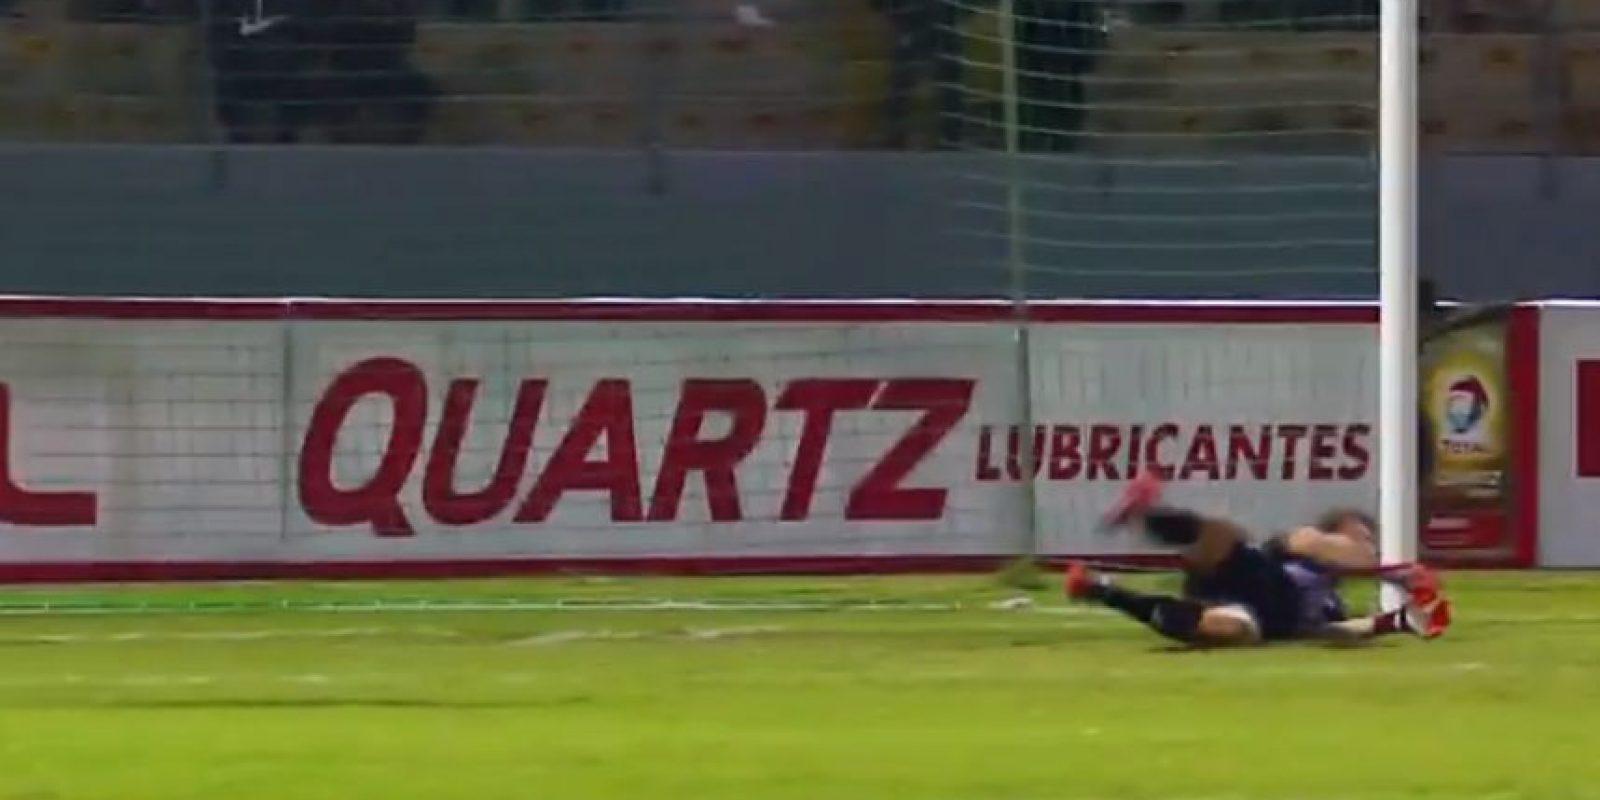 Detuvo el segundo, sexto, séptimo y décimo disparos Foto:Youtube: FootballManiaChannel